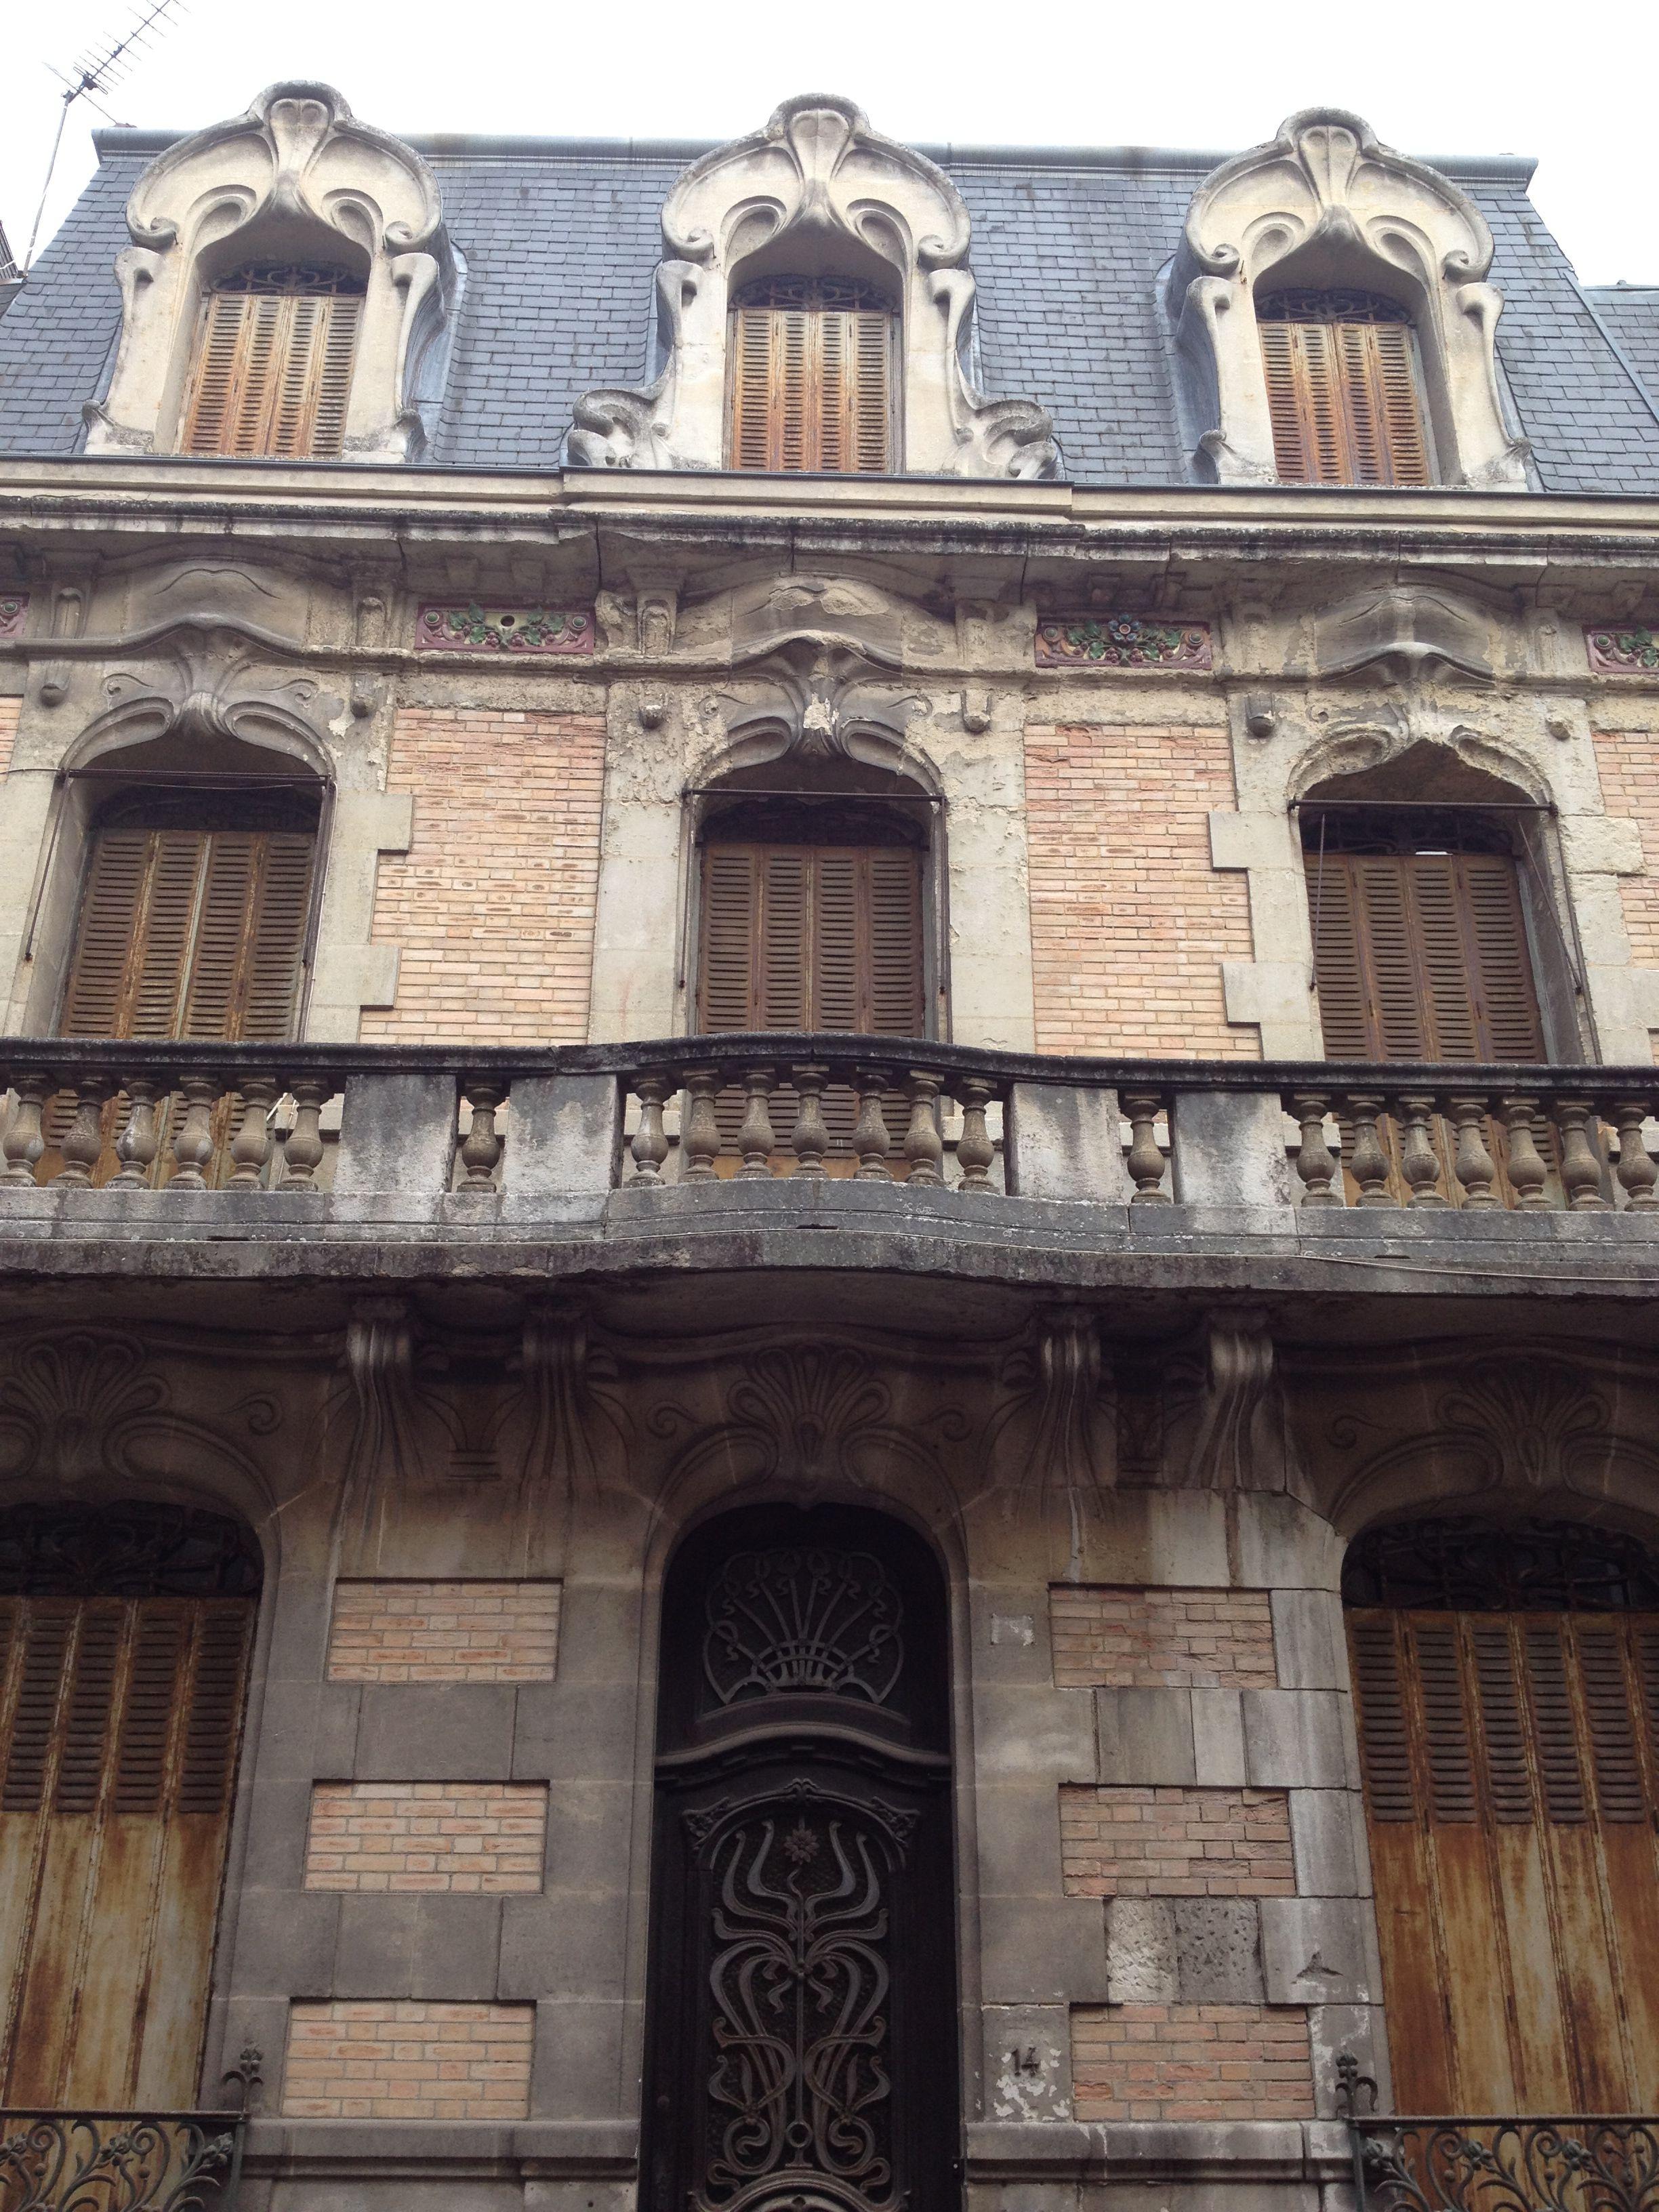 Hotel particulier vichy VichyArt Nouveau Hotel particulier